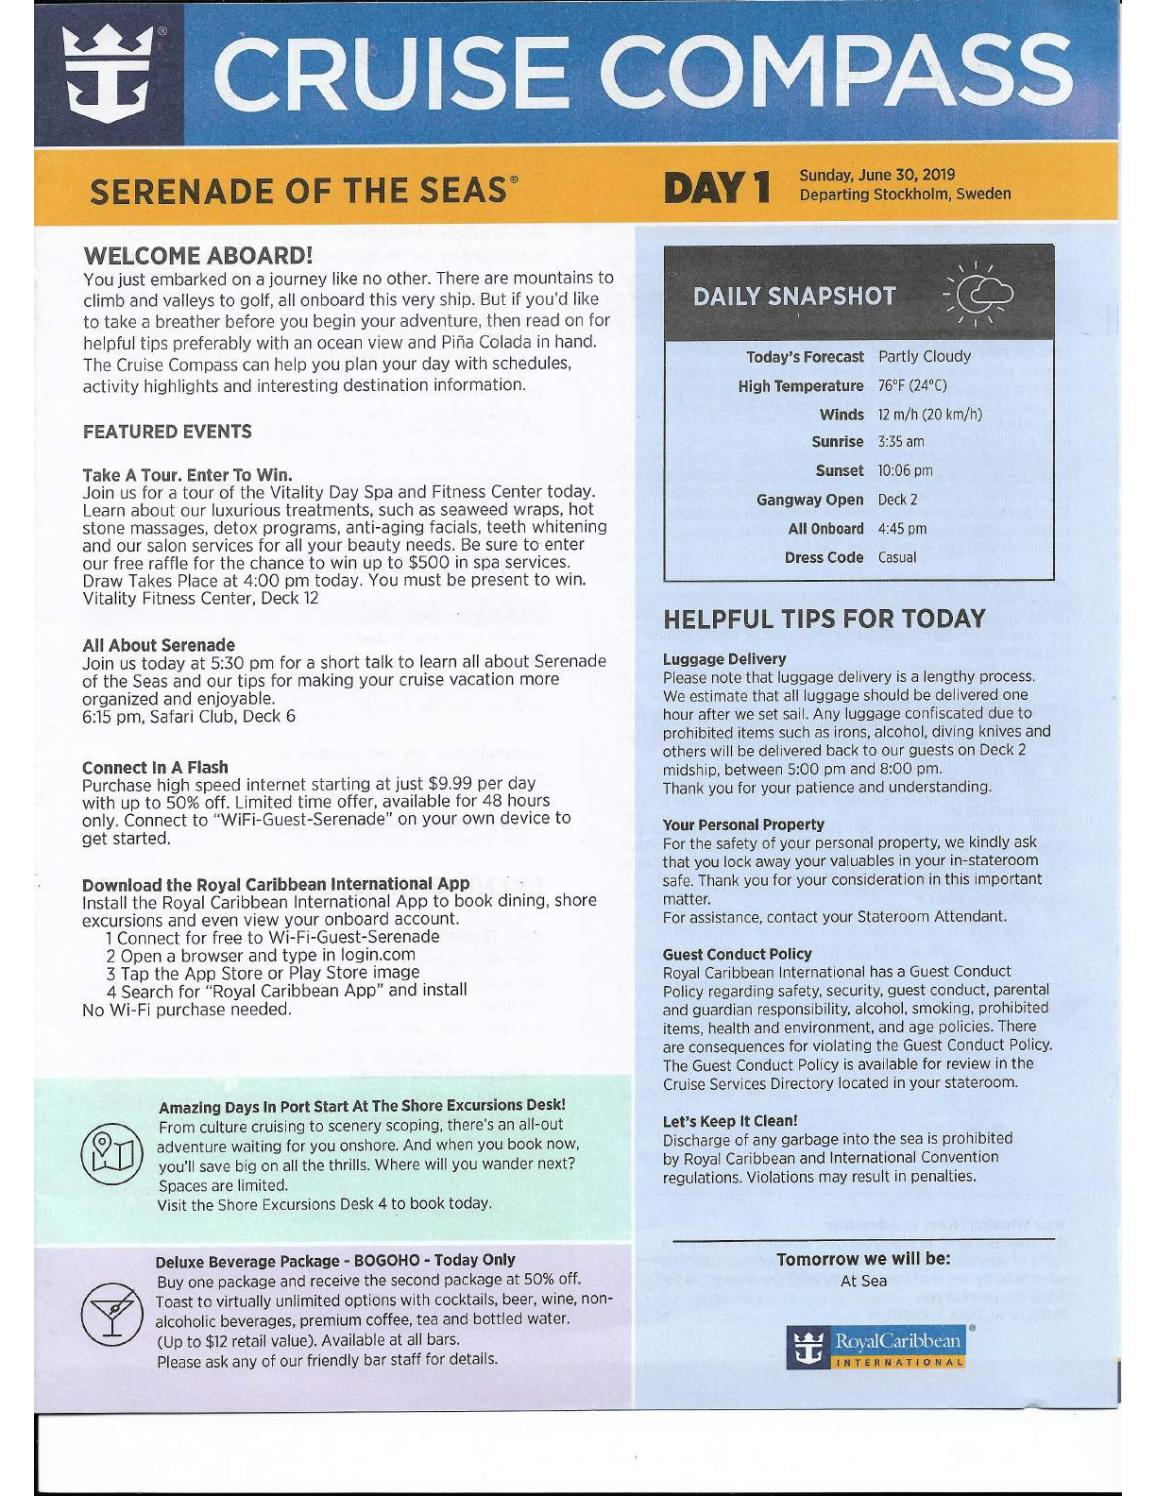 Serenade of the Seas 7-Night Scandinavia and Russia Cruise